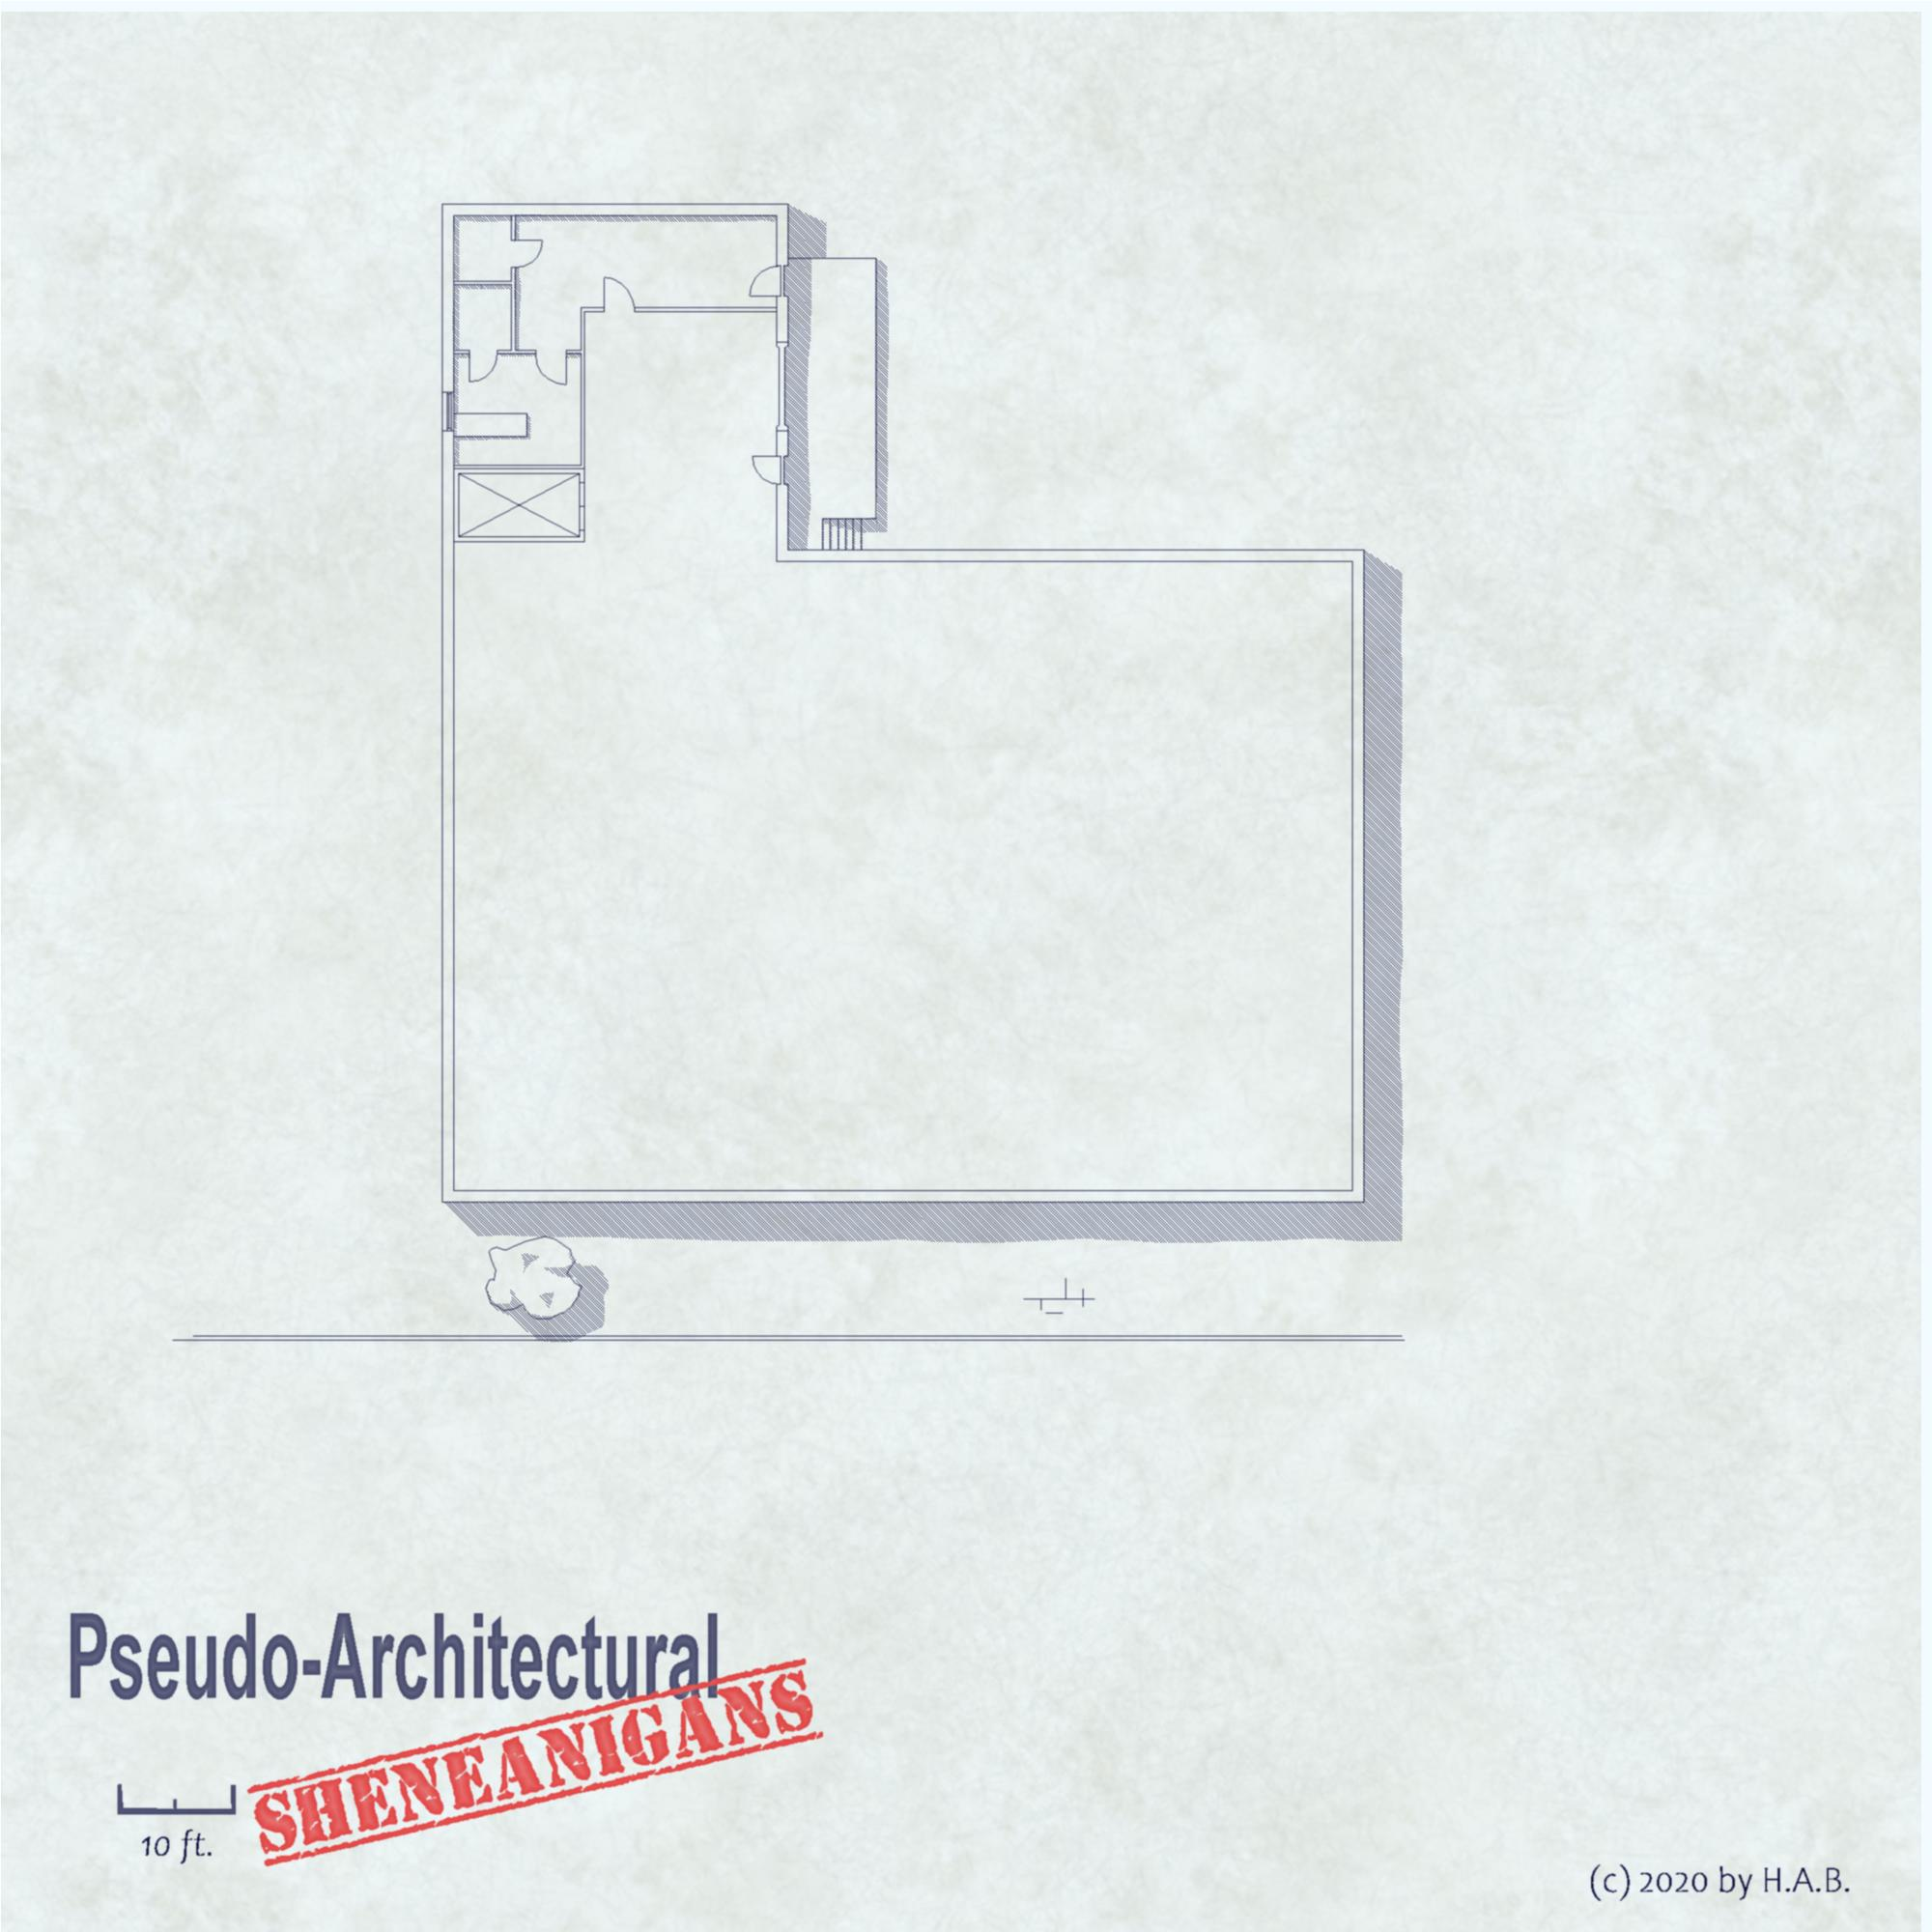 Pseudo Architectural Shenanigans.JPG